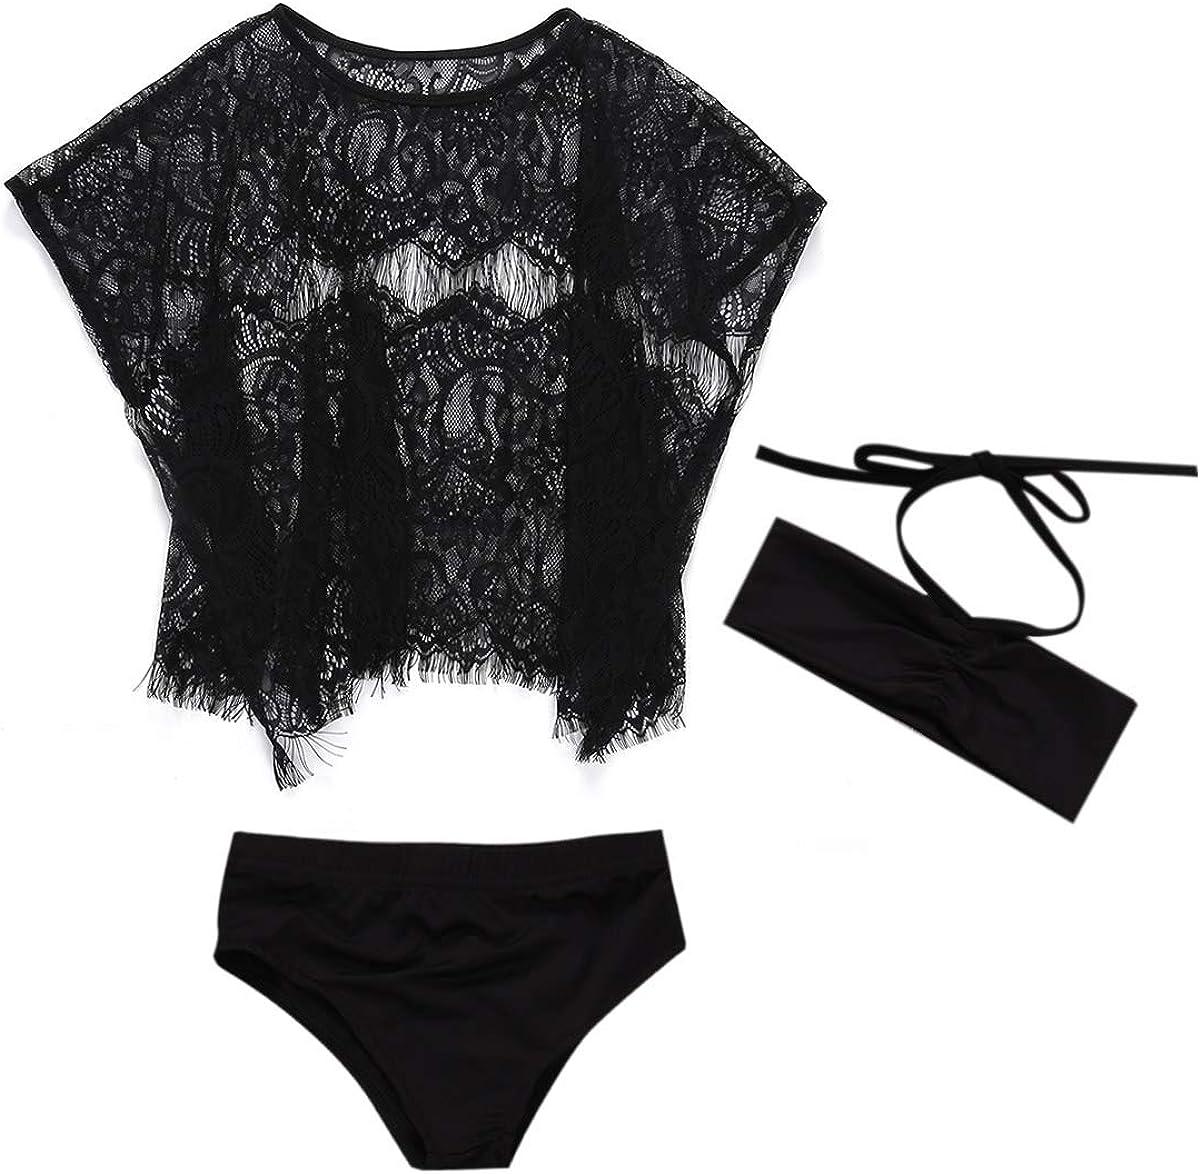 Bottom+Mesh Lace Cover Up Sets Beach Wear 3 pcs Swimwear Little Girls Bikini Top